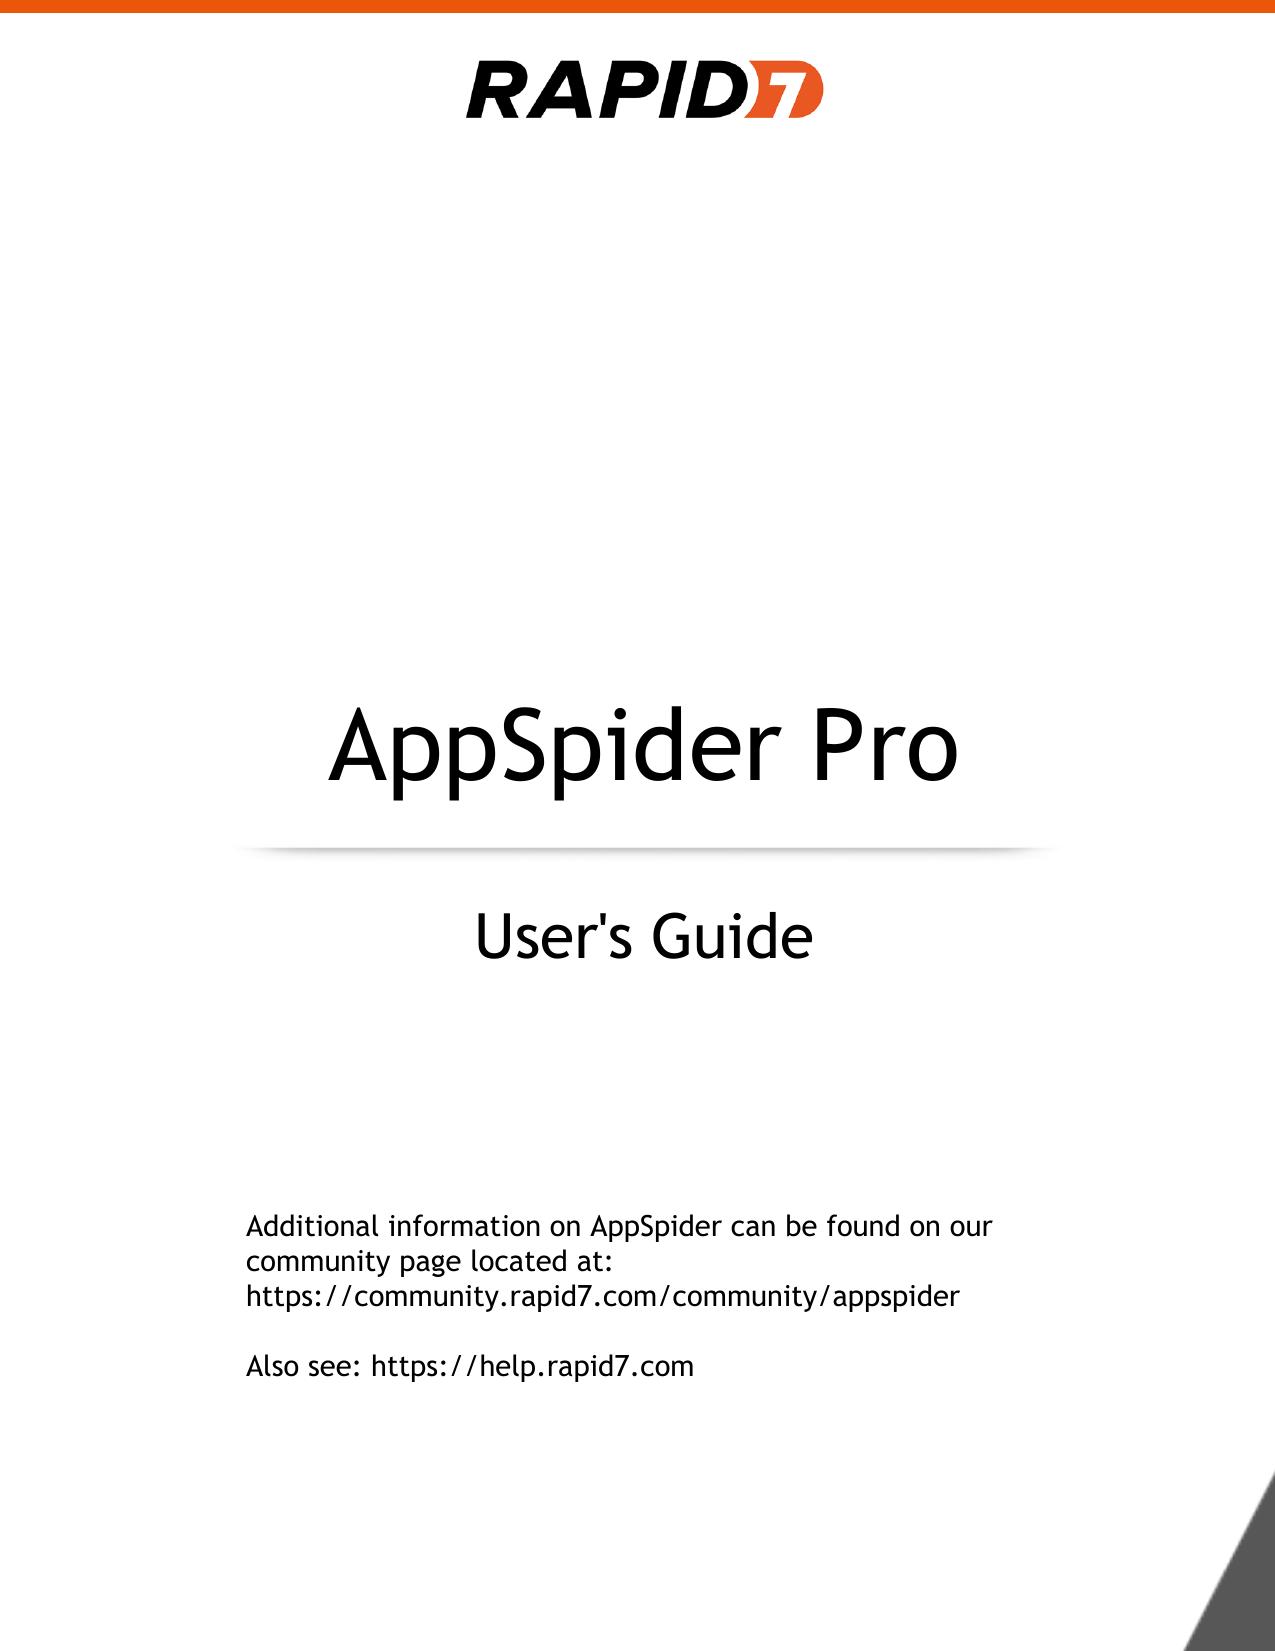 AppSpider Pro 7 0 User Guide | manualzz com